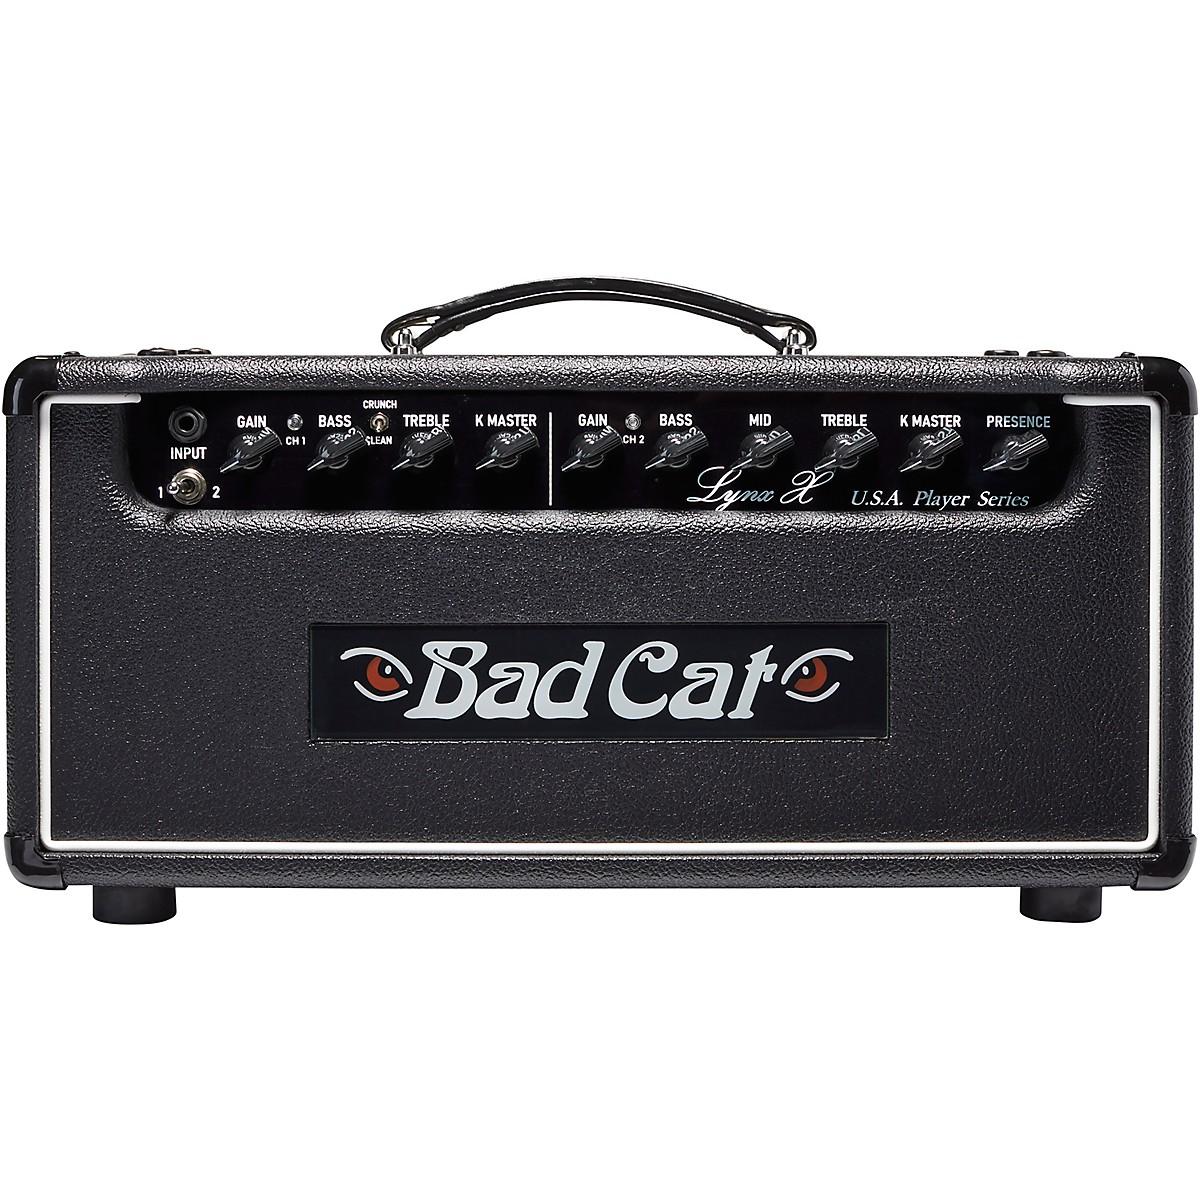 Bad Cat Lynx X 40W Tube Guitar Amp Head